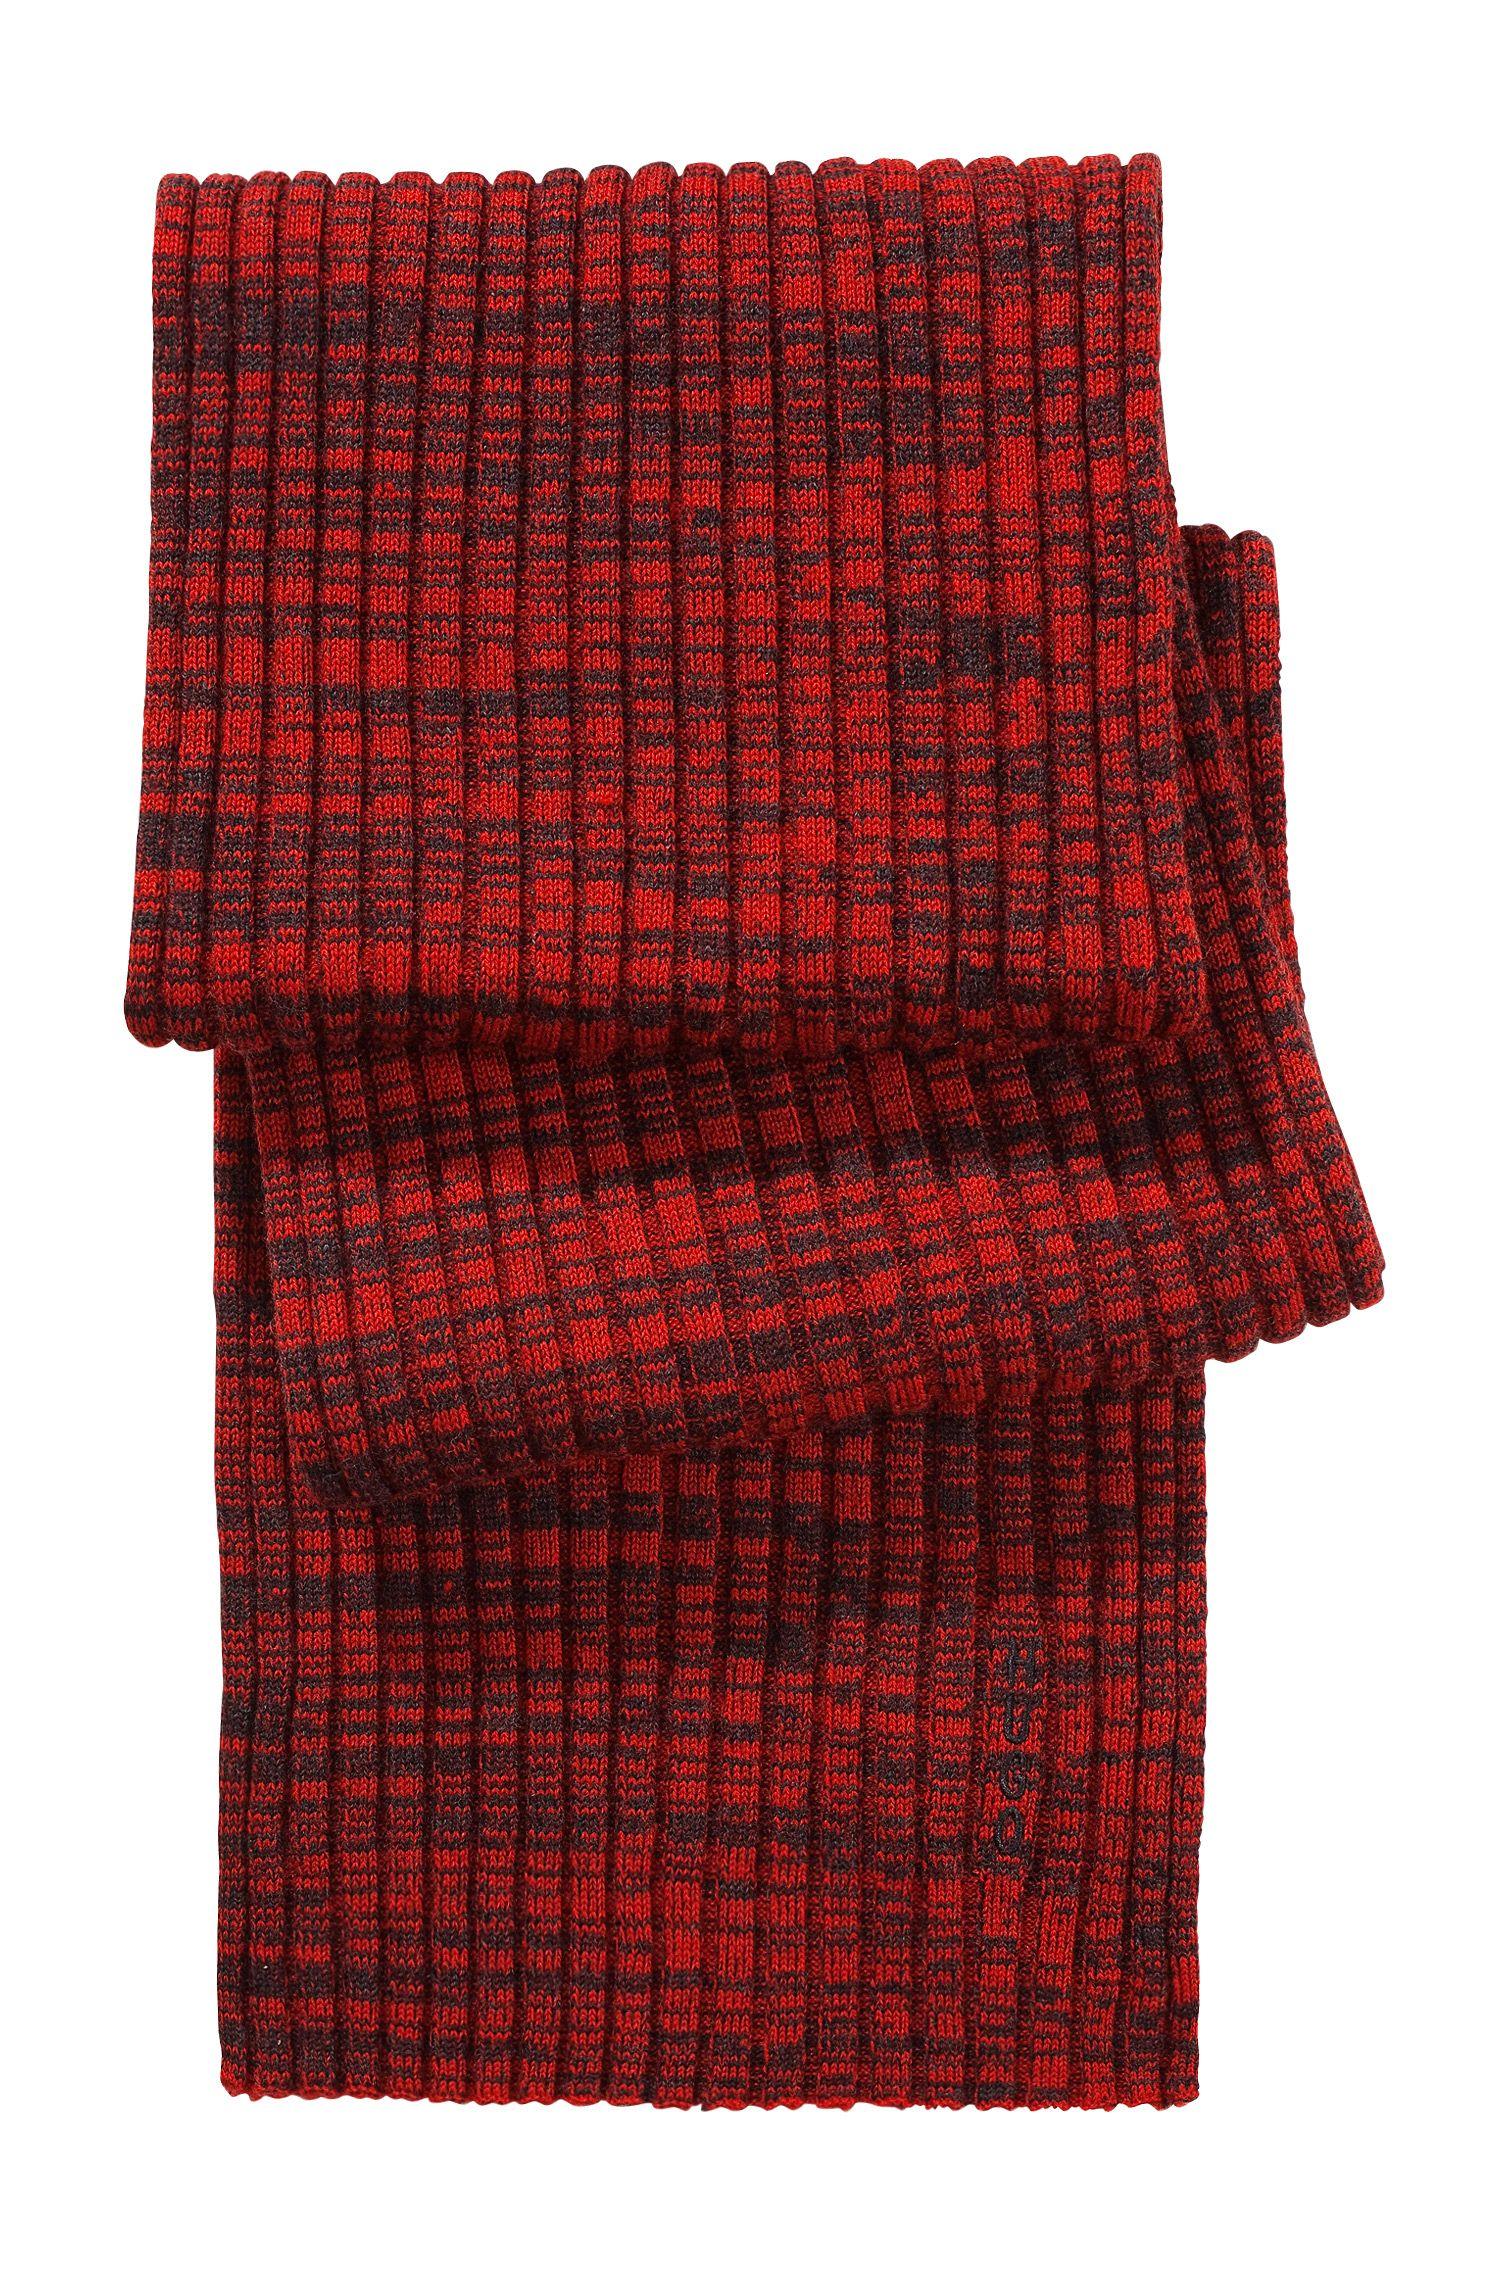 Foulard en fine maille de laine vierge, Zapo_1